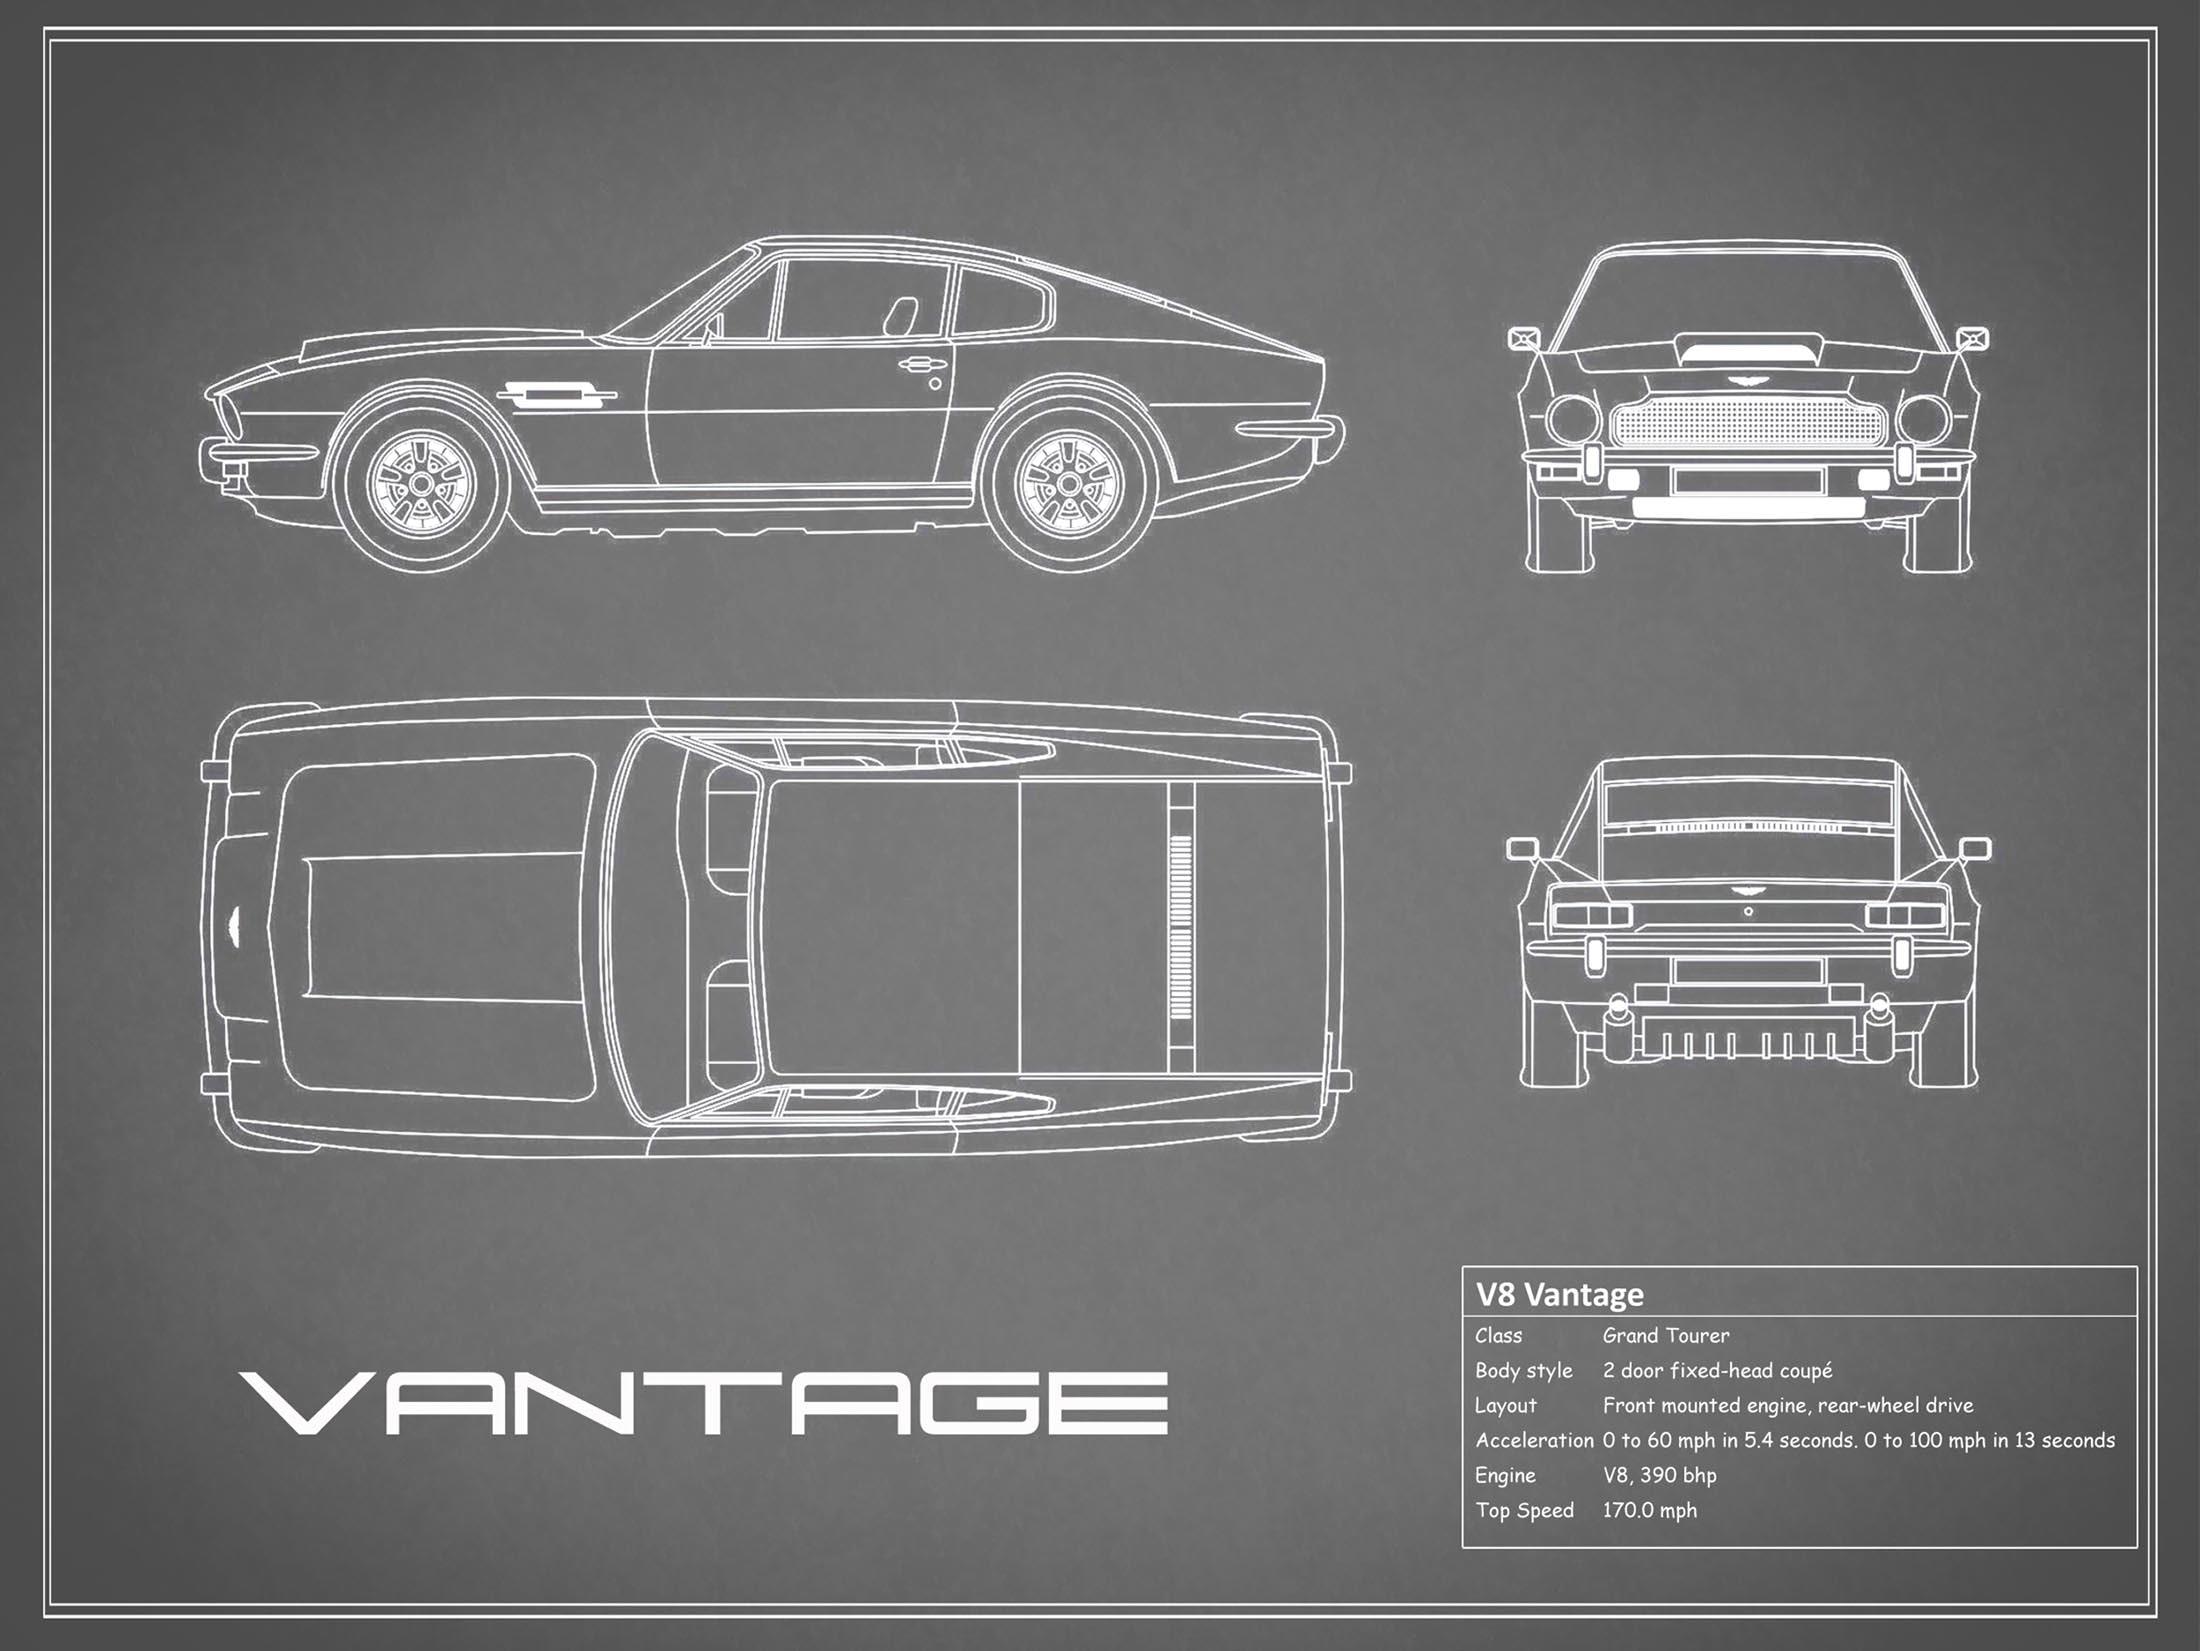 Aston Martin V8 Vantage - Gray